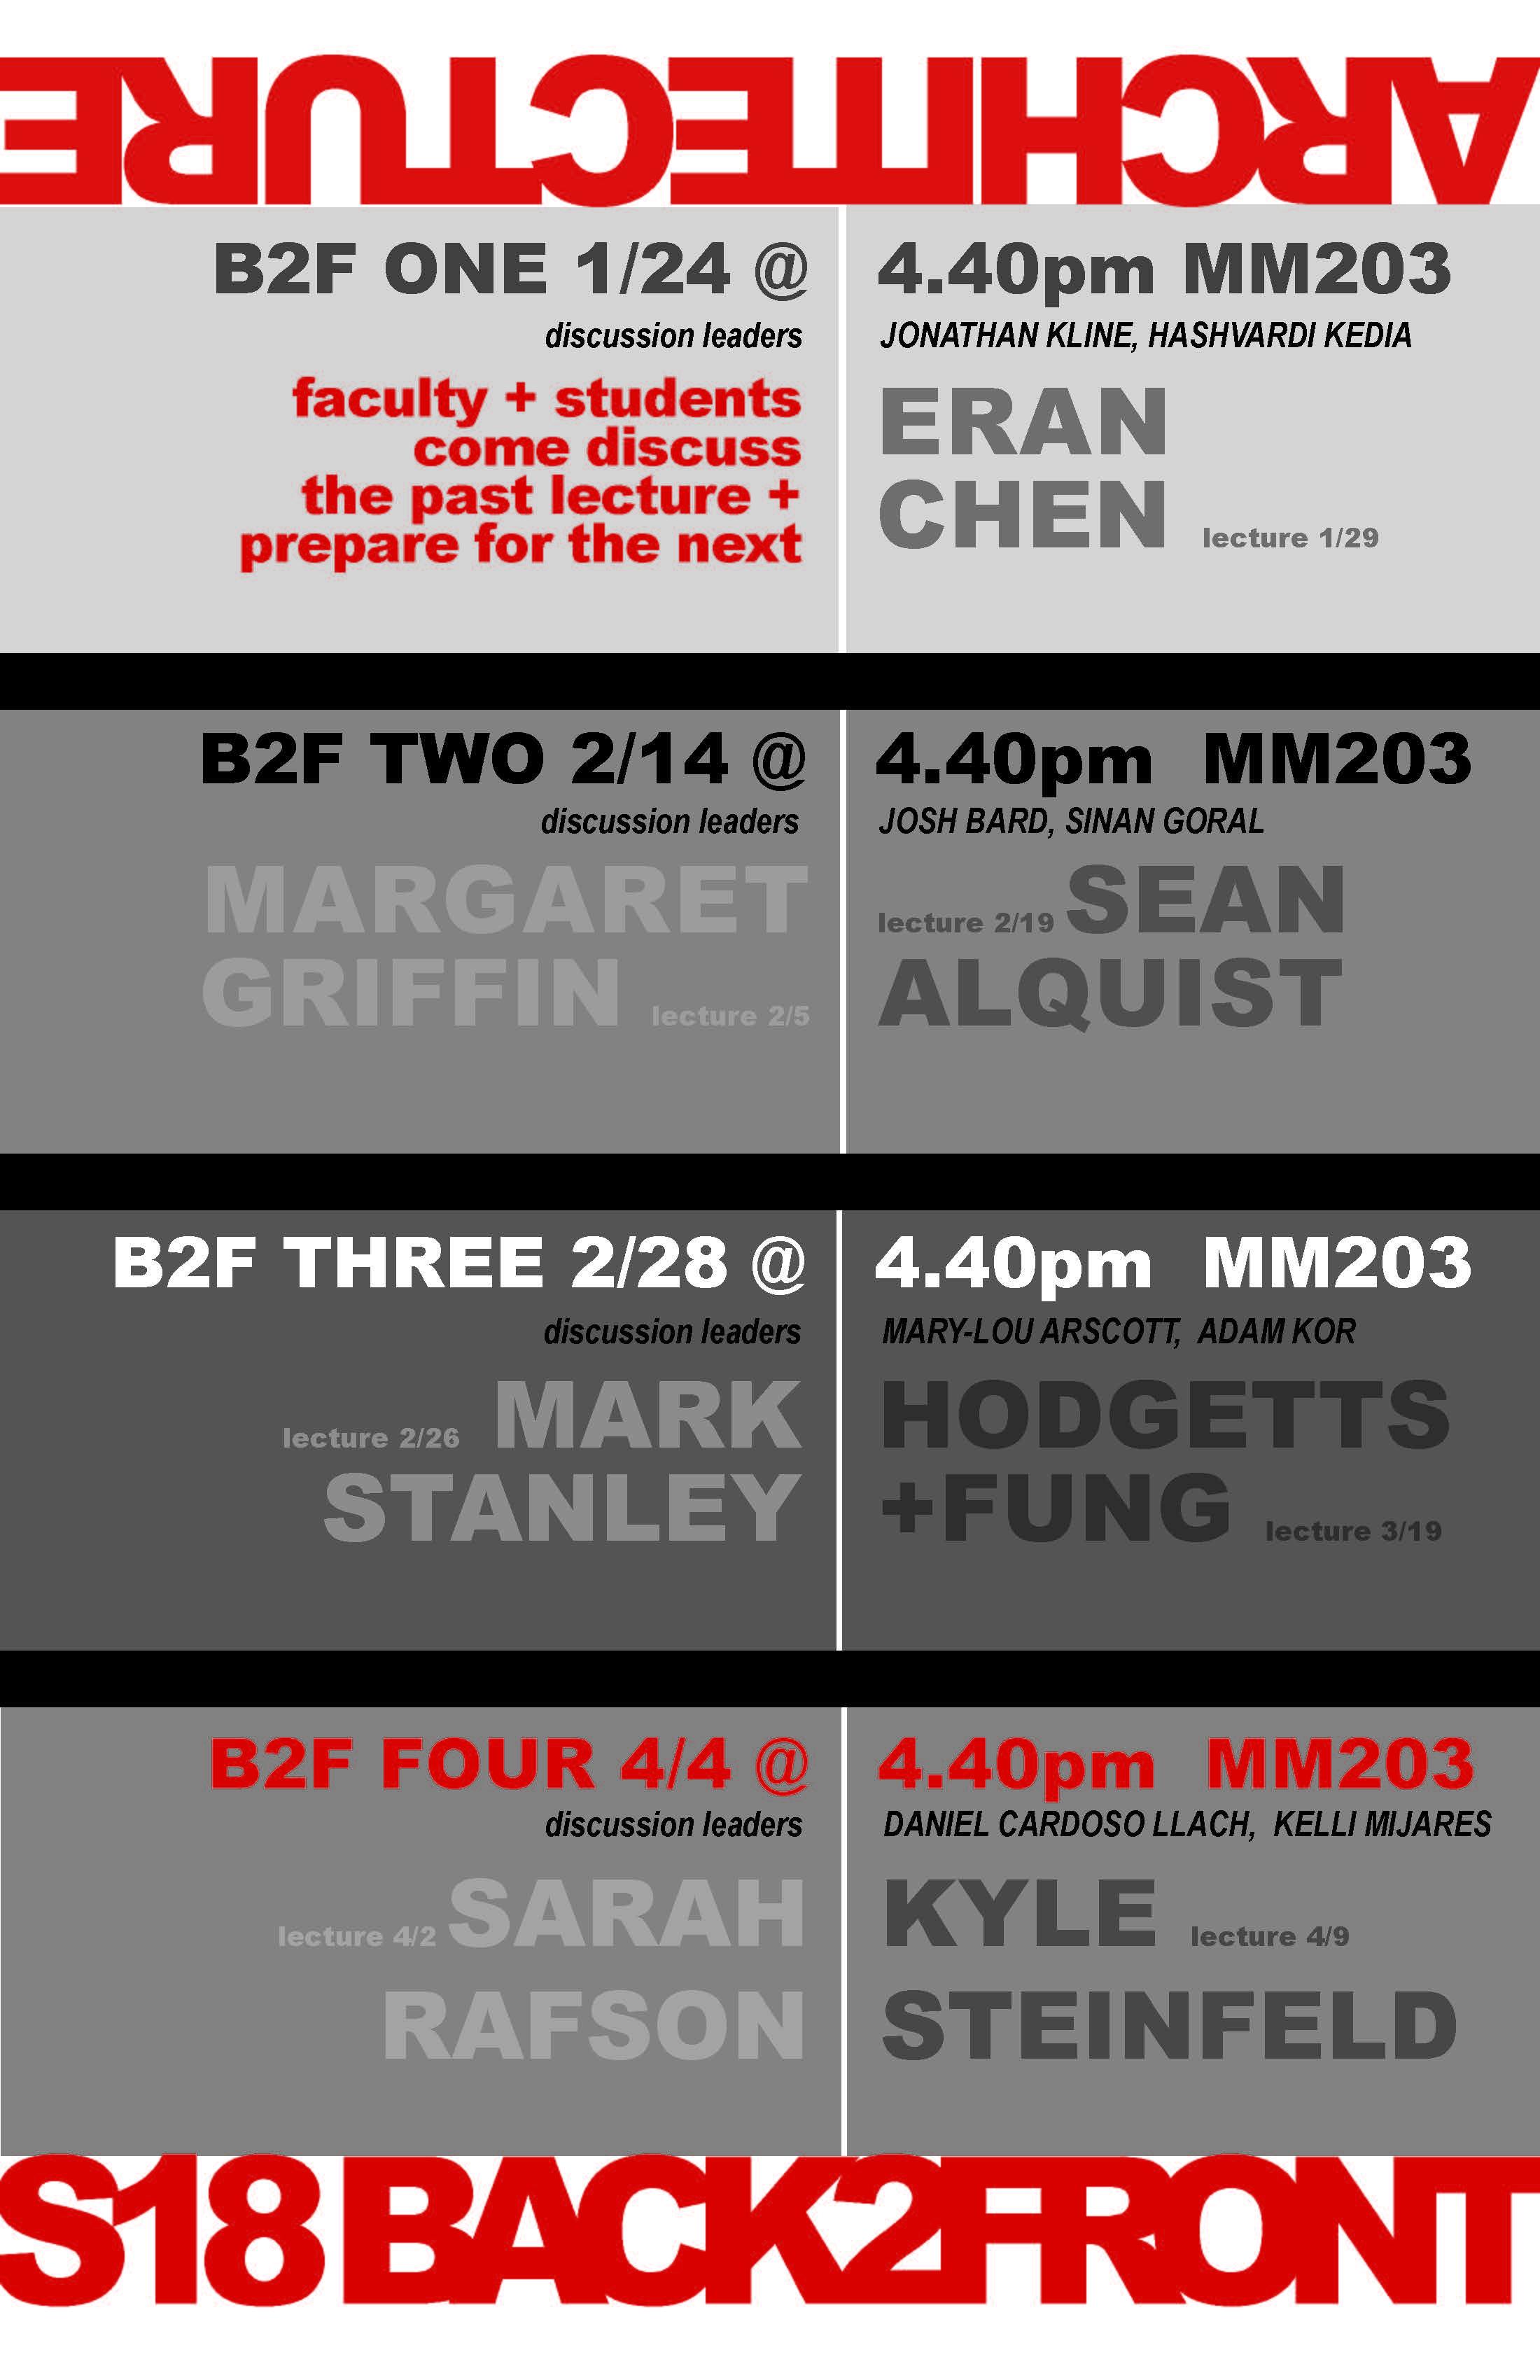 B2F poster 1-19.jpg